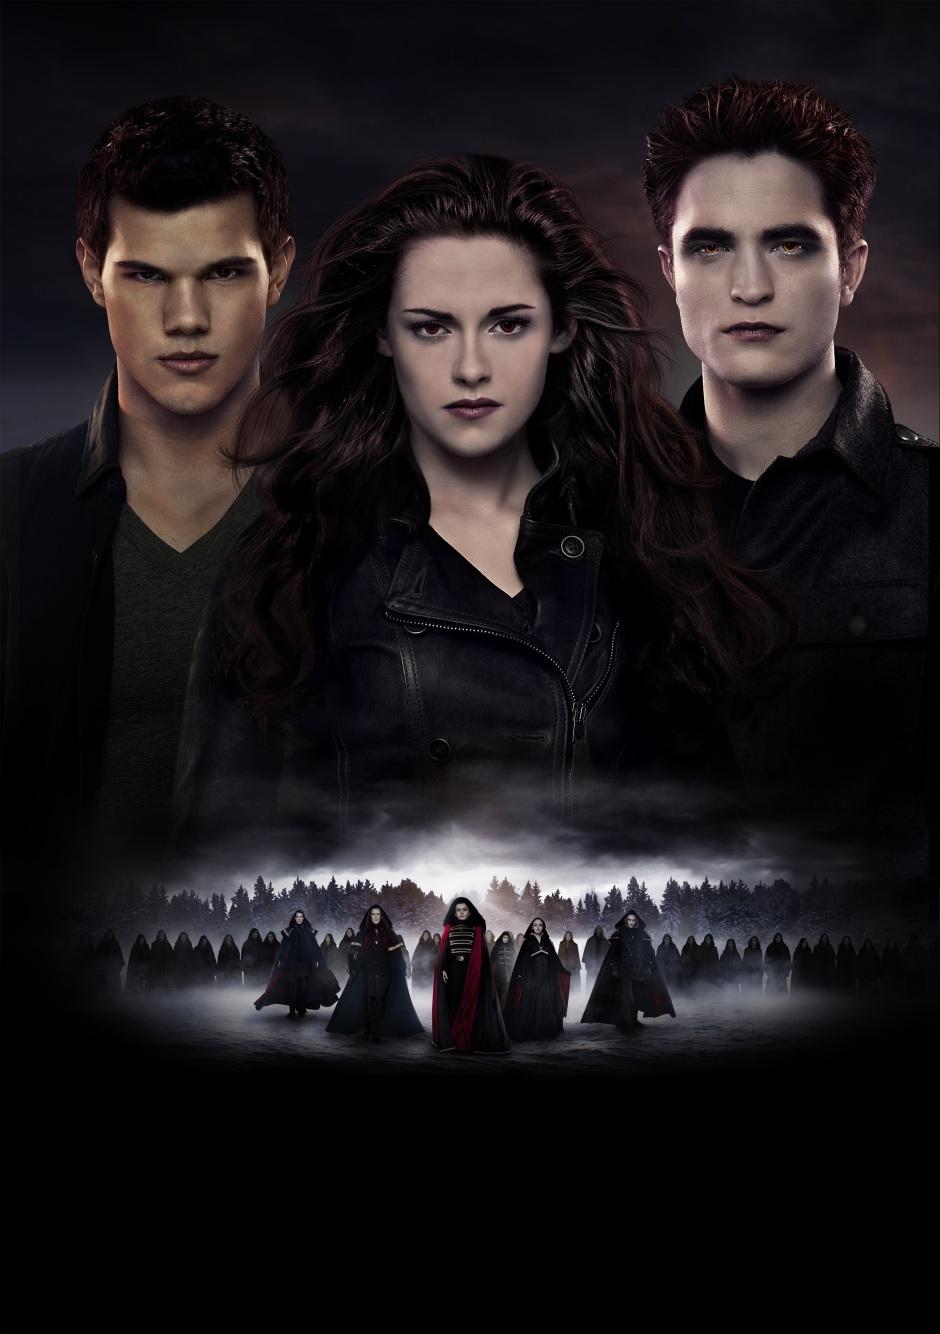 The-Twilight-Saga-Breaking-Dawn-Part-2-3